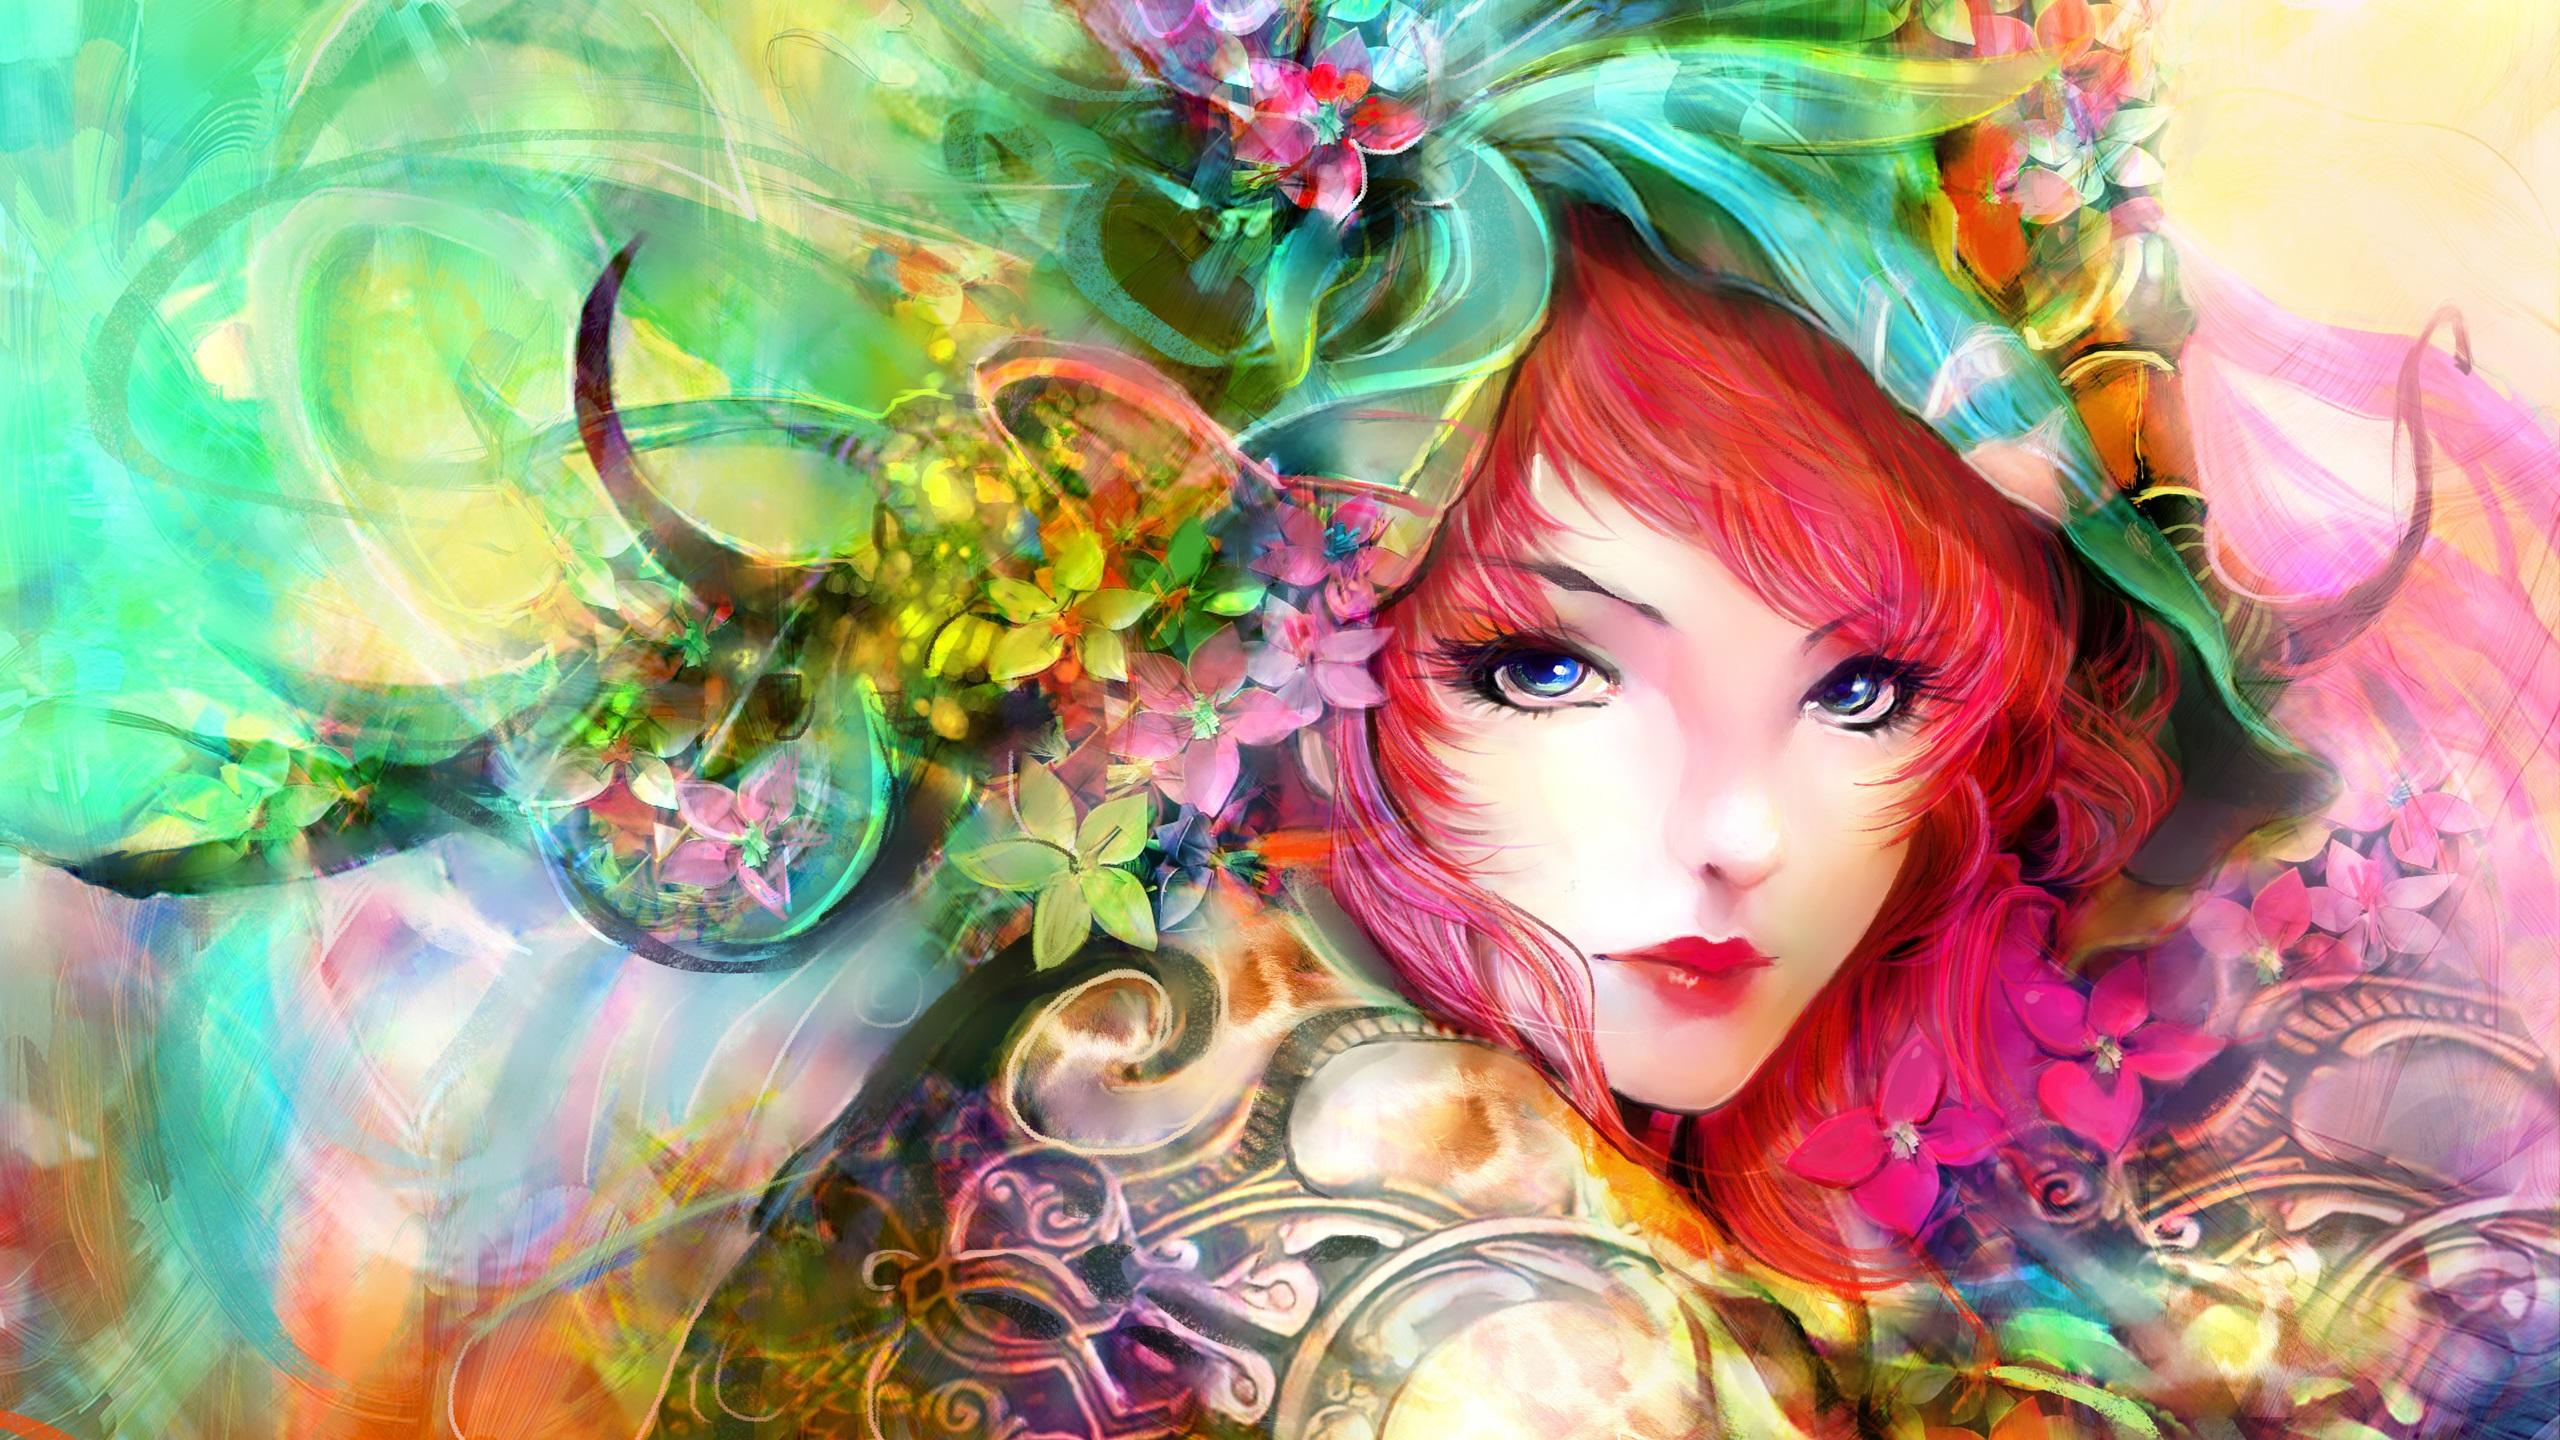 Kunst Malerei, Mädchen, Augen, Gesicht, Blumen, rote Haare, bunte ...: https://de.best-wallpaper.net/Art-painting-girl-eyes-face-flowers-red-hair-colorful_2560x1440.html